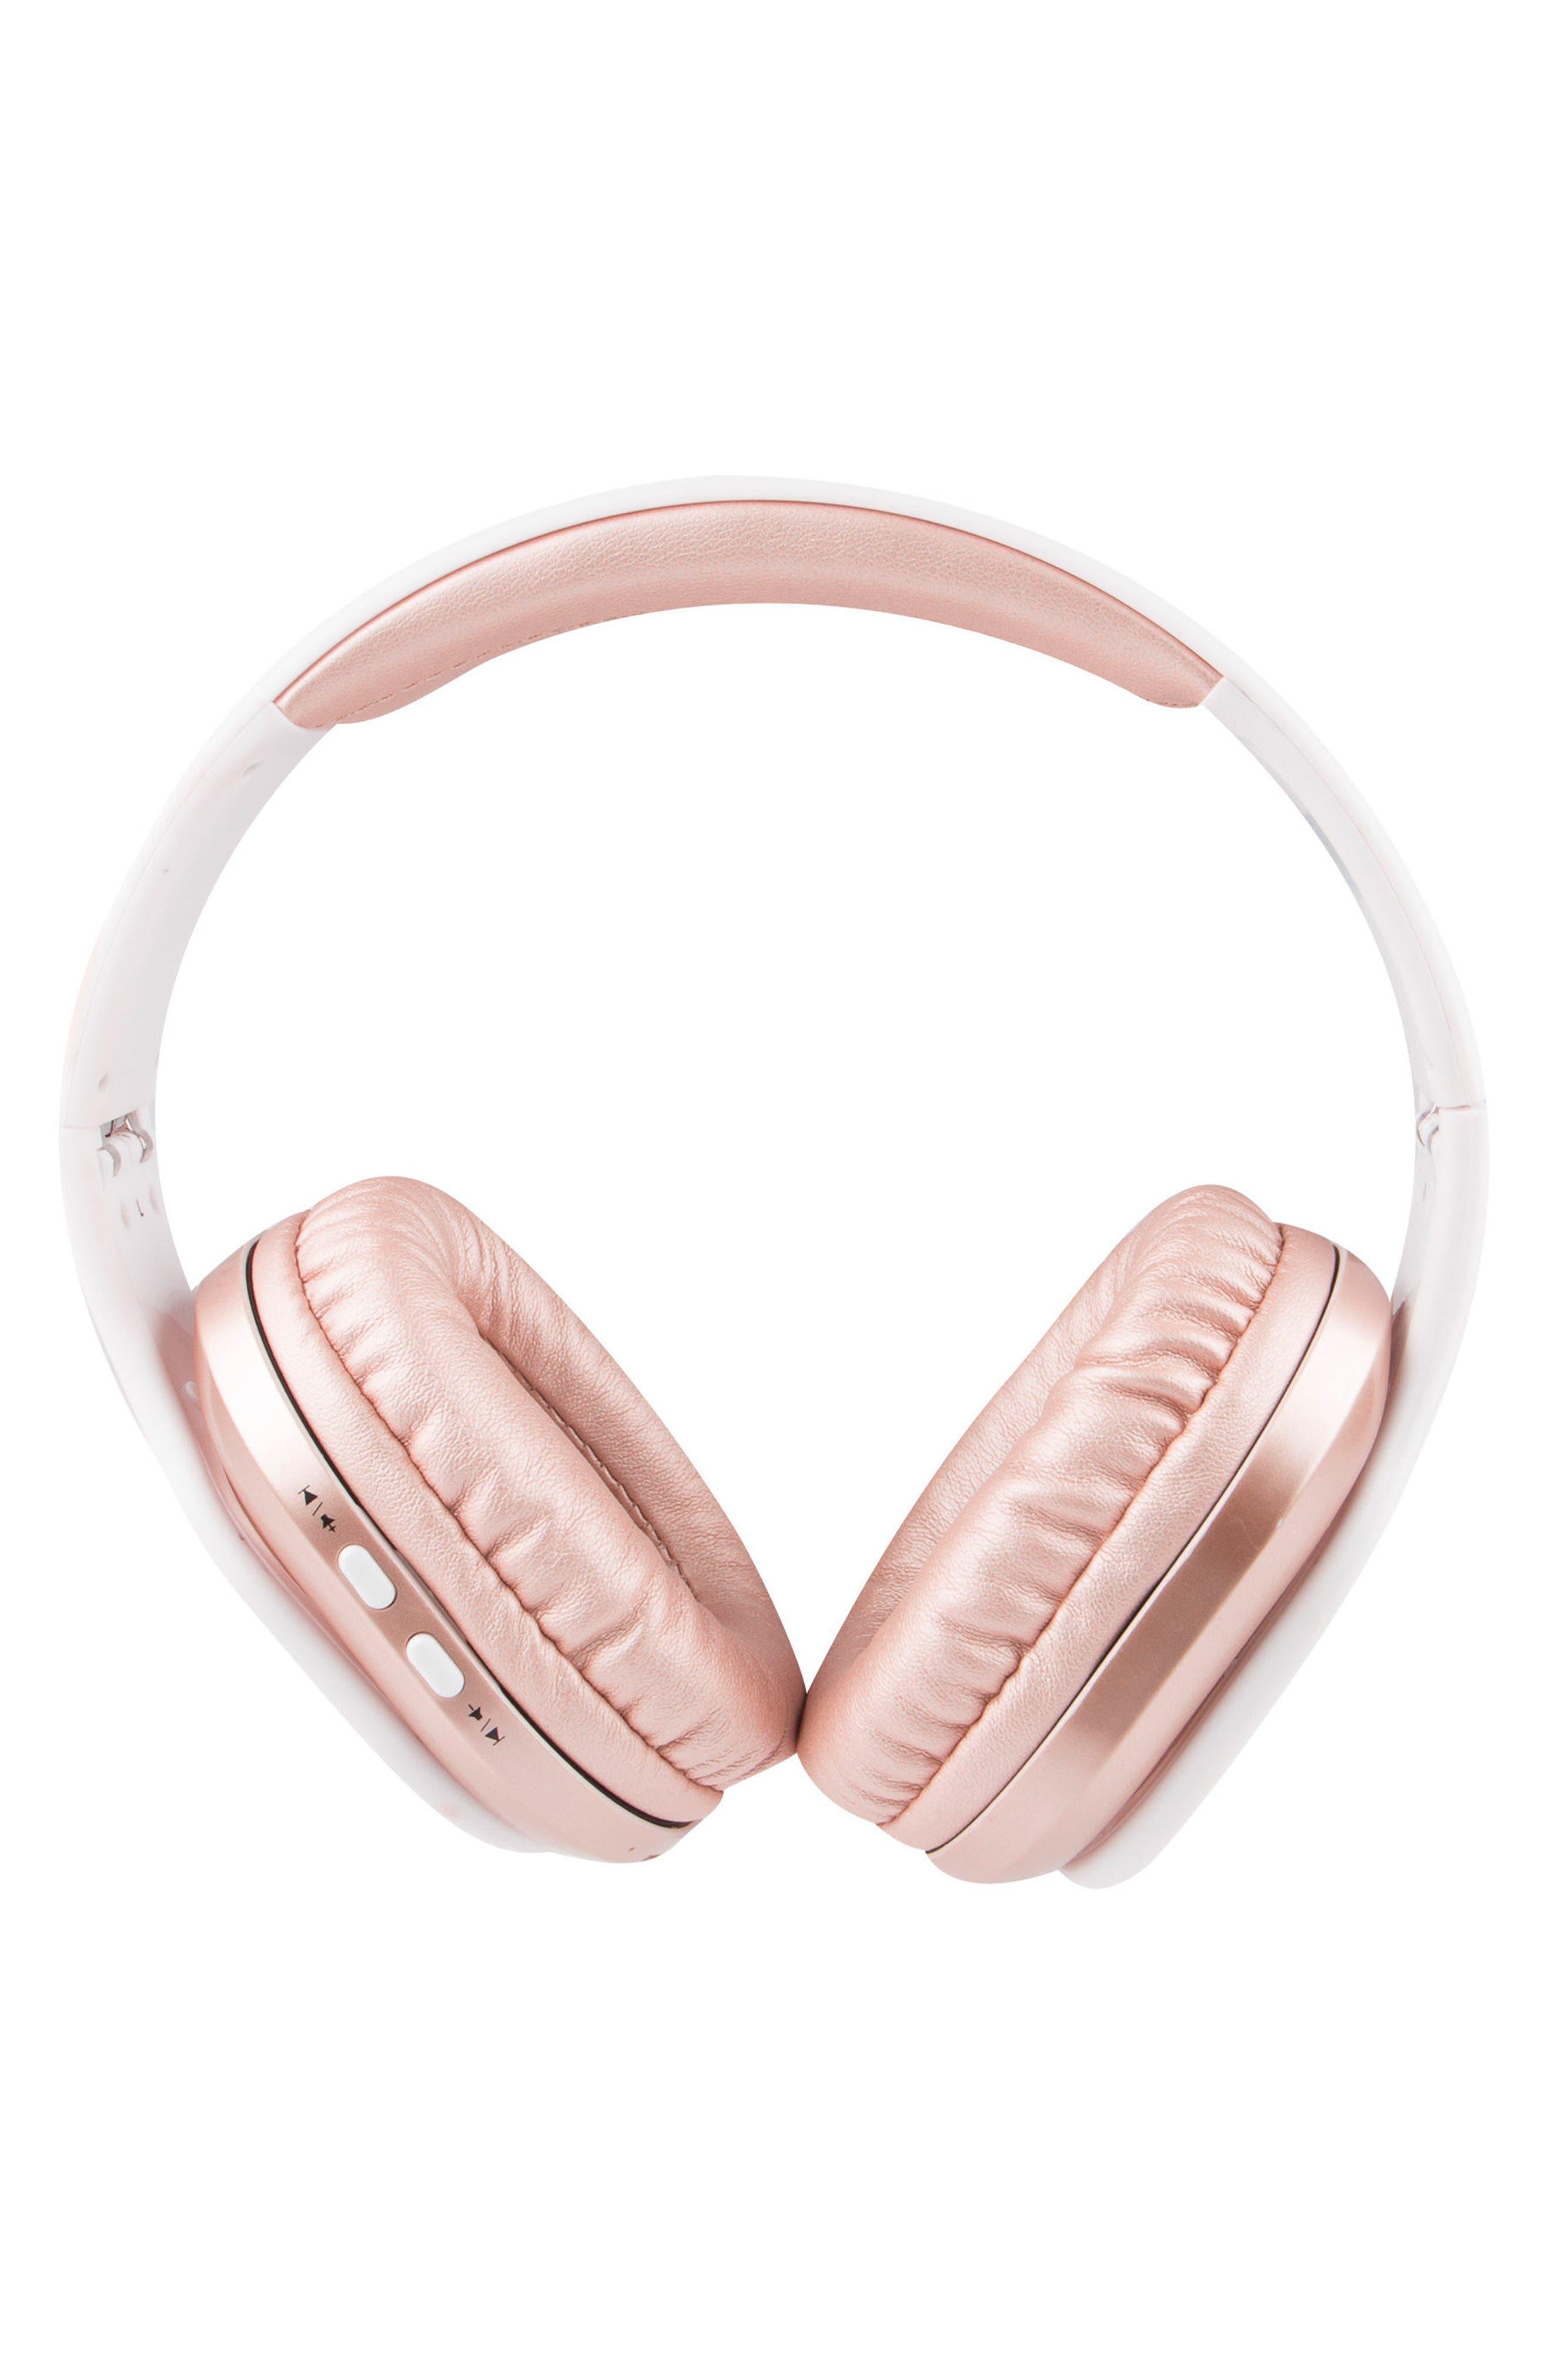 ALTEC LANSING,                             Evolution 2 Wireless Headphones,                             Main thumbnail 1, color,                             ROSE GOLD